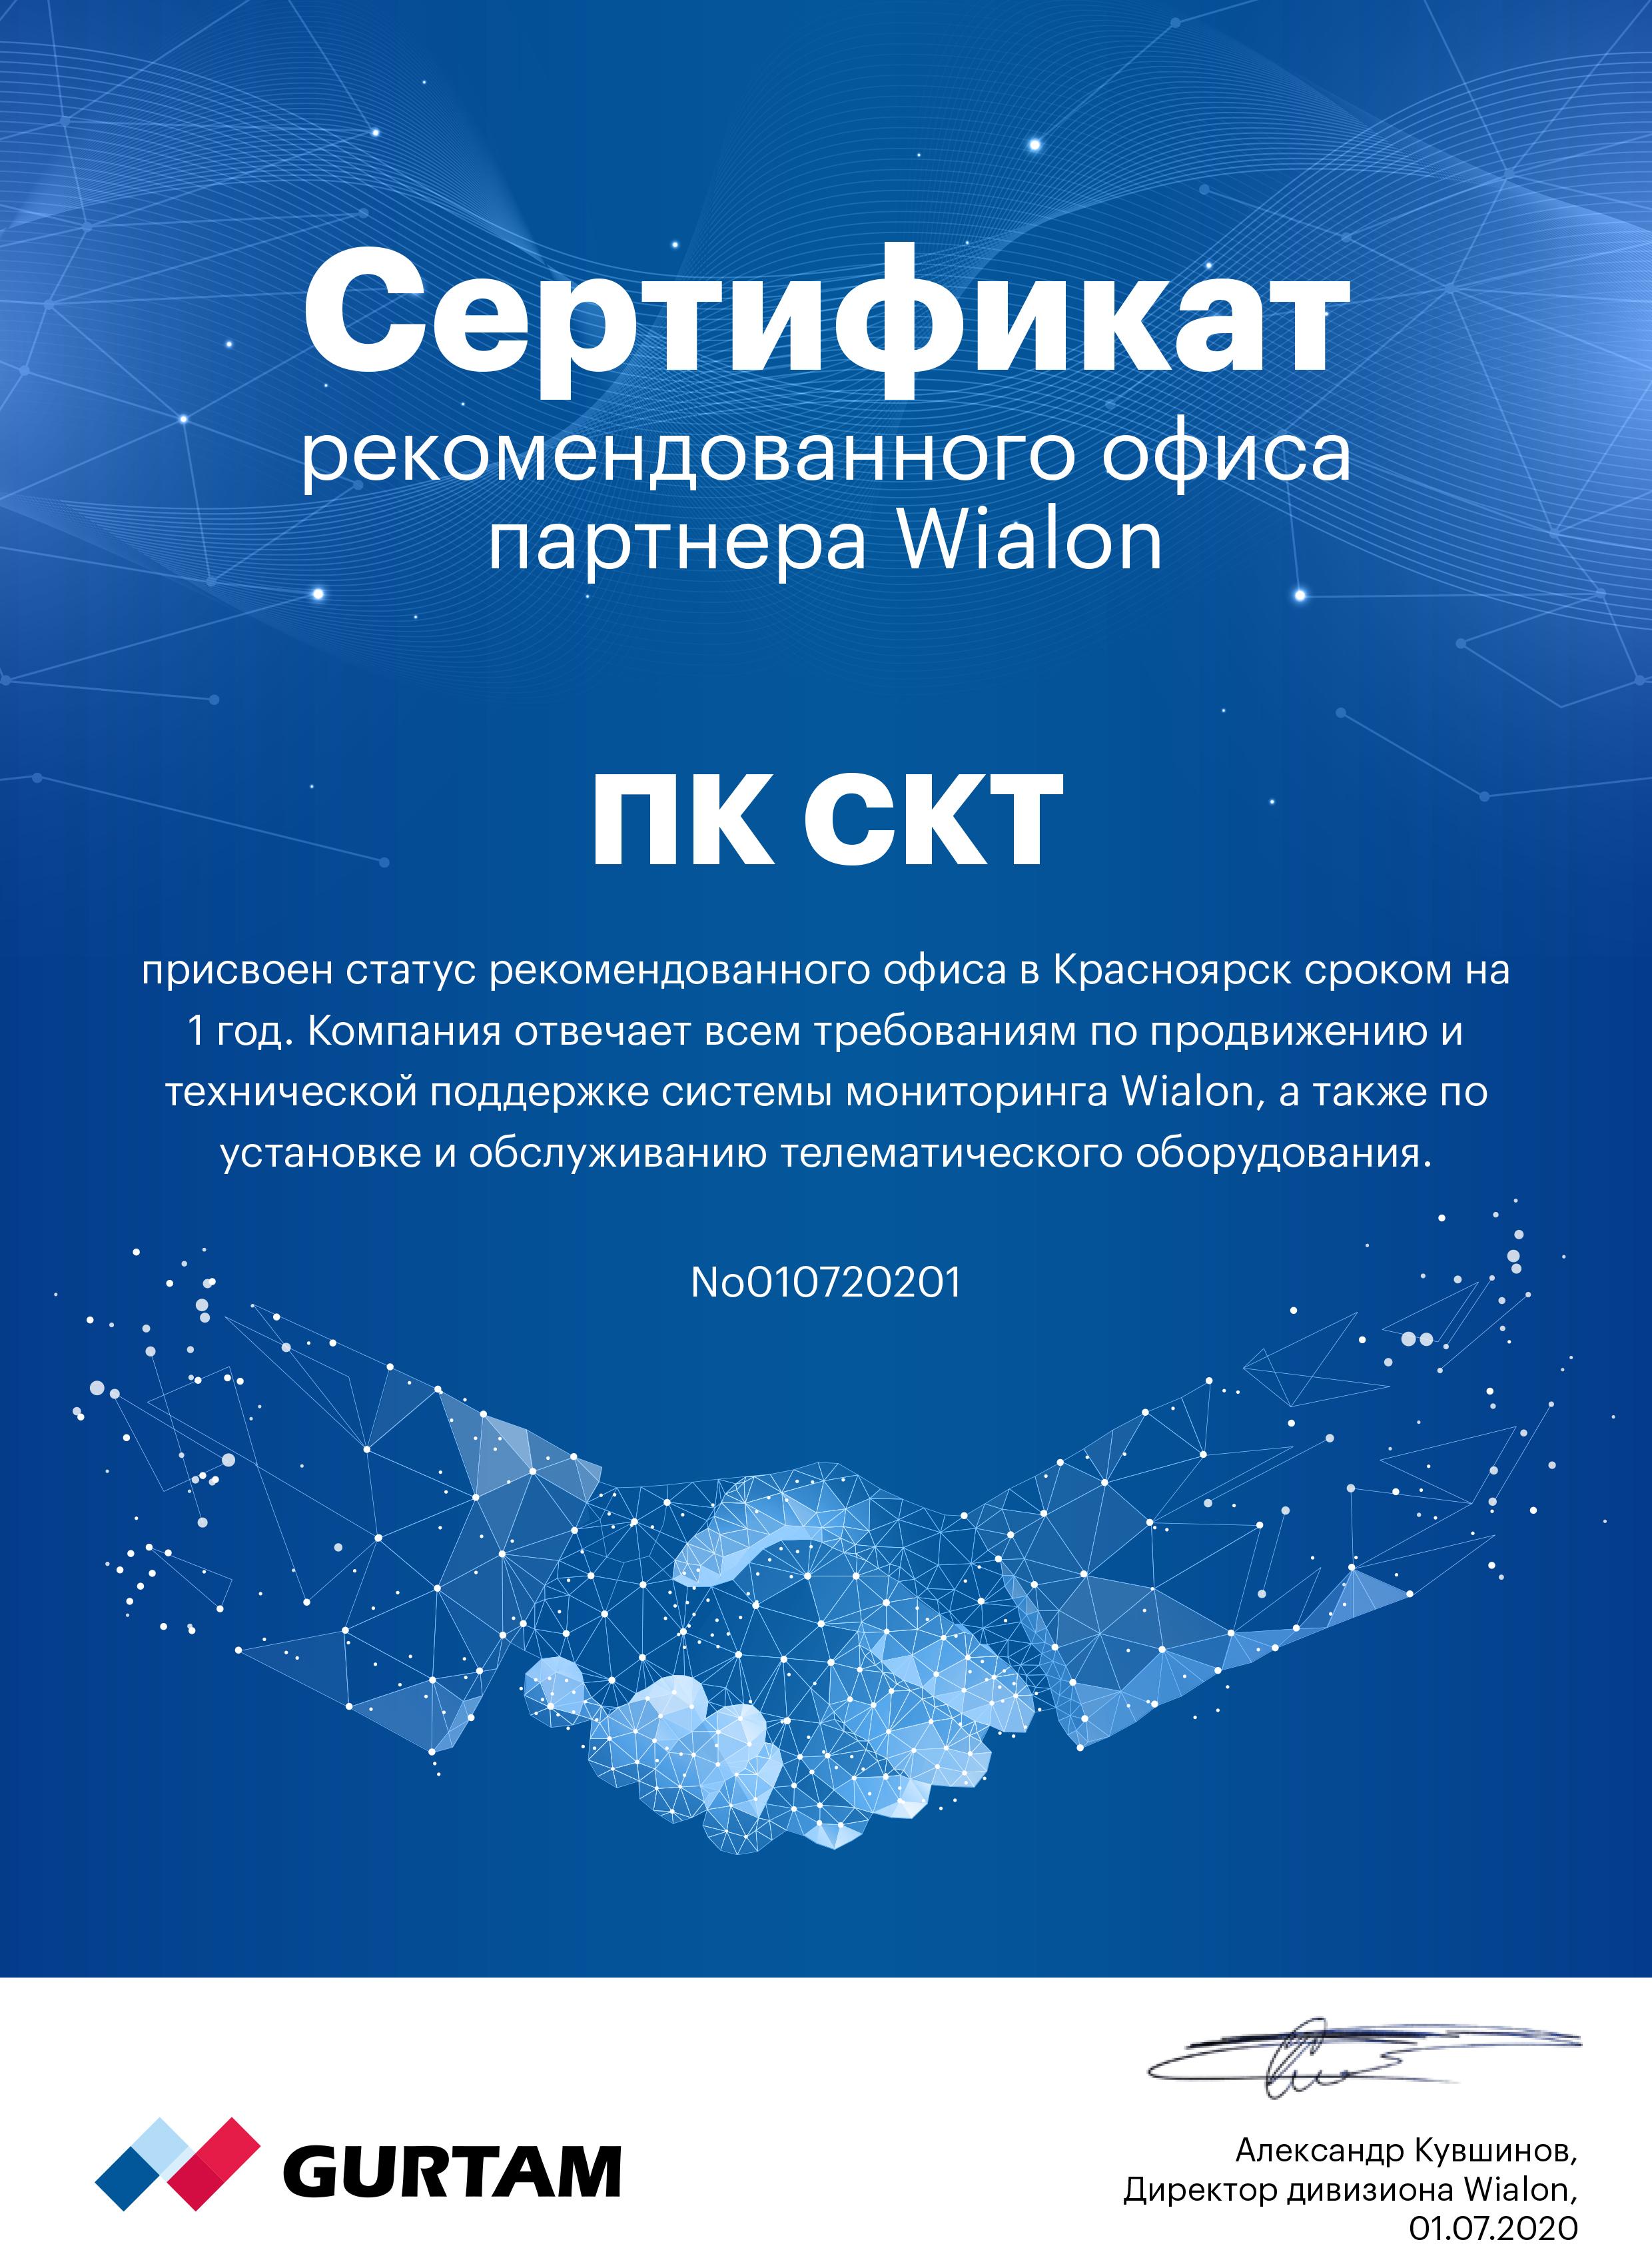 Сертификат Gurtam